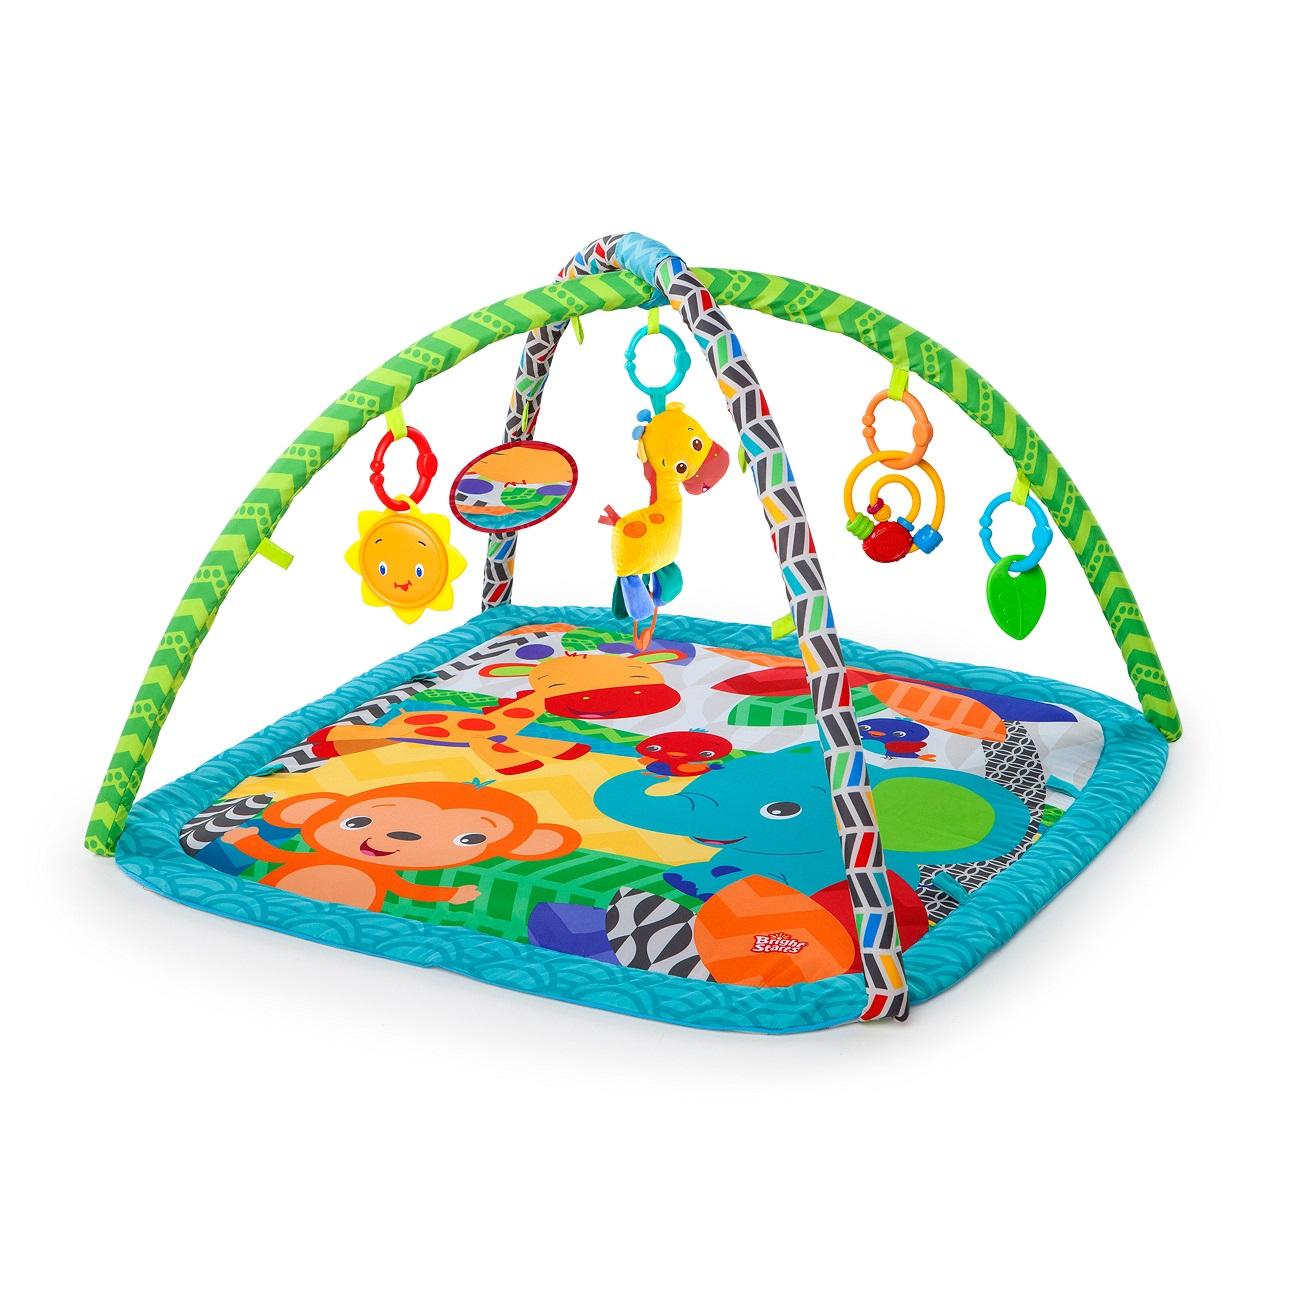 Развивающий коврик  Веселый жираф, с игрушками - Детские развивающие коврики для новорожденных, артикул: 155999